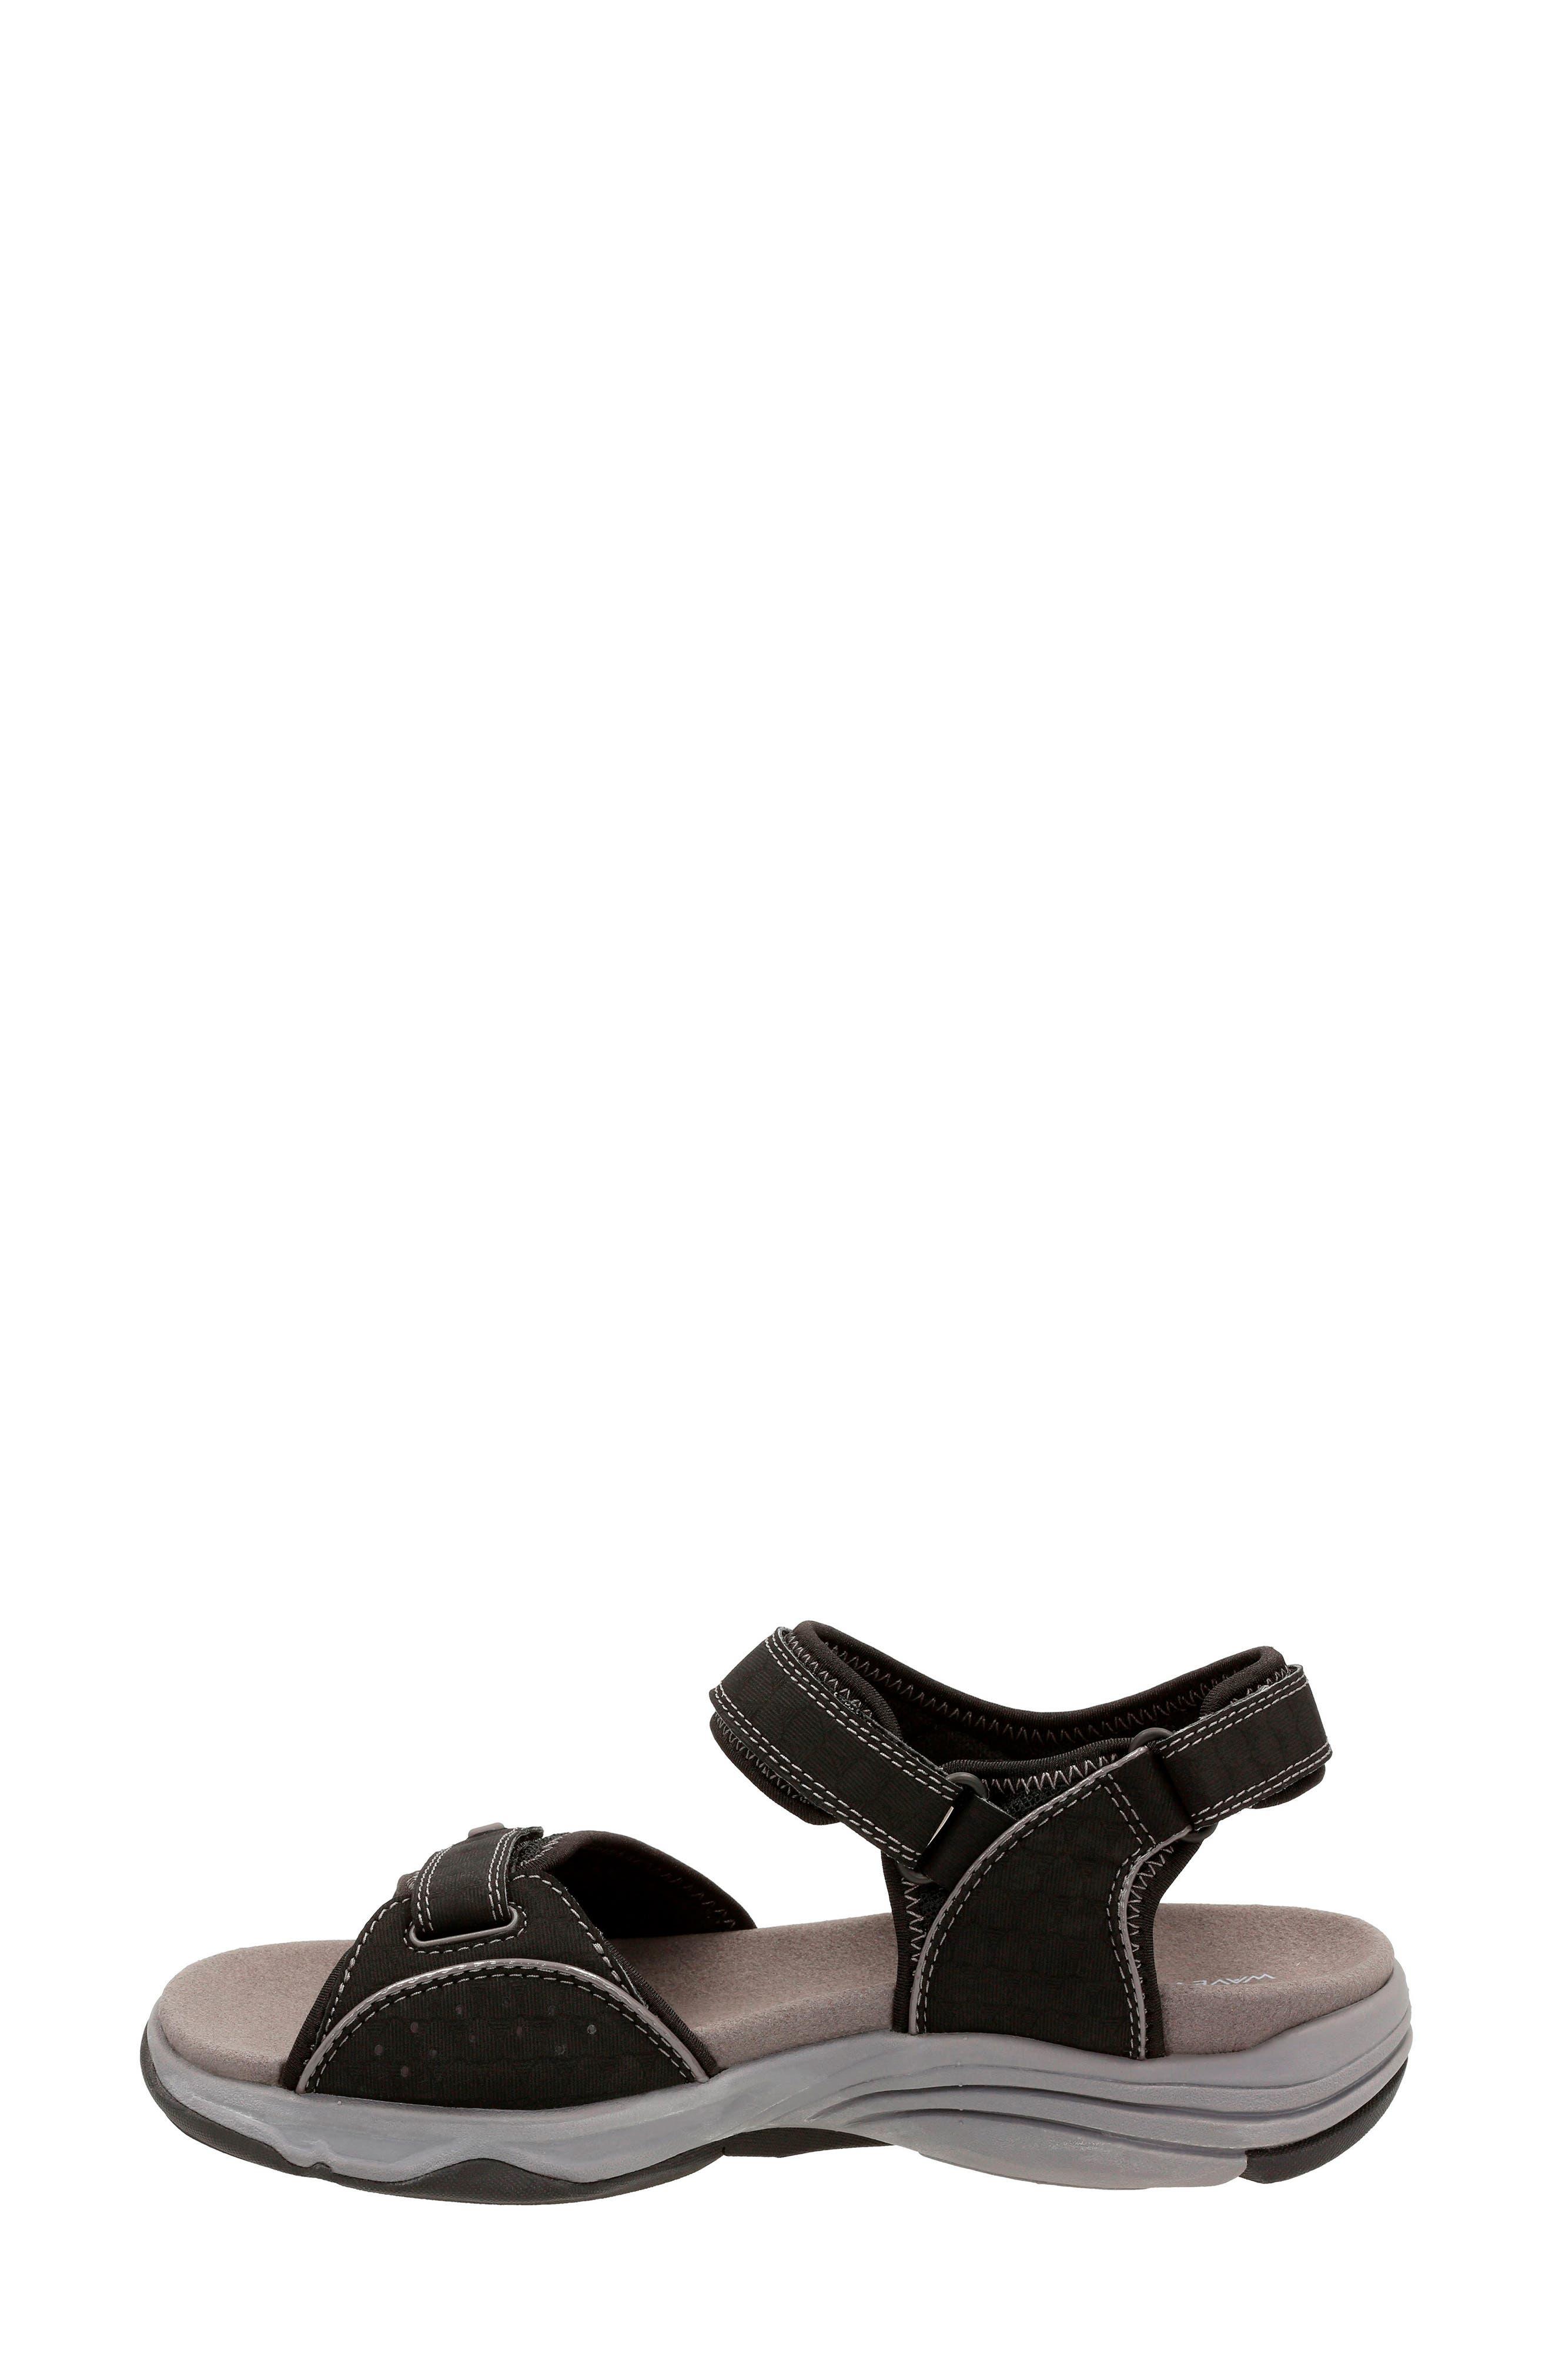 Wave Grip Sandal,                             Alternate thumbnail 2, color,                             BLACK FABRIC